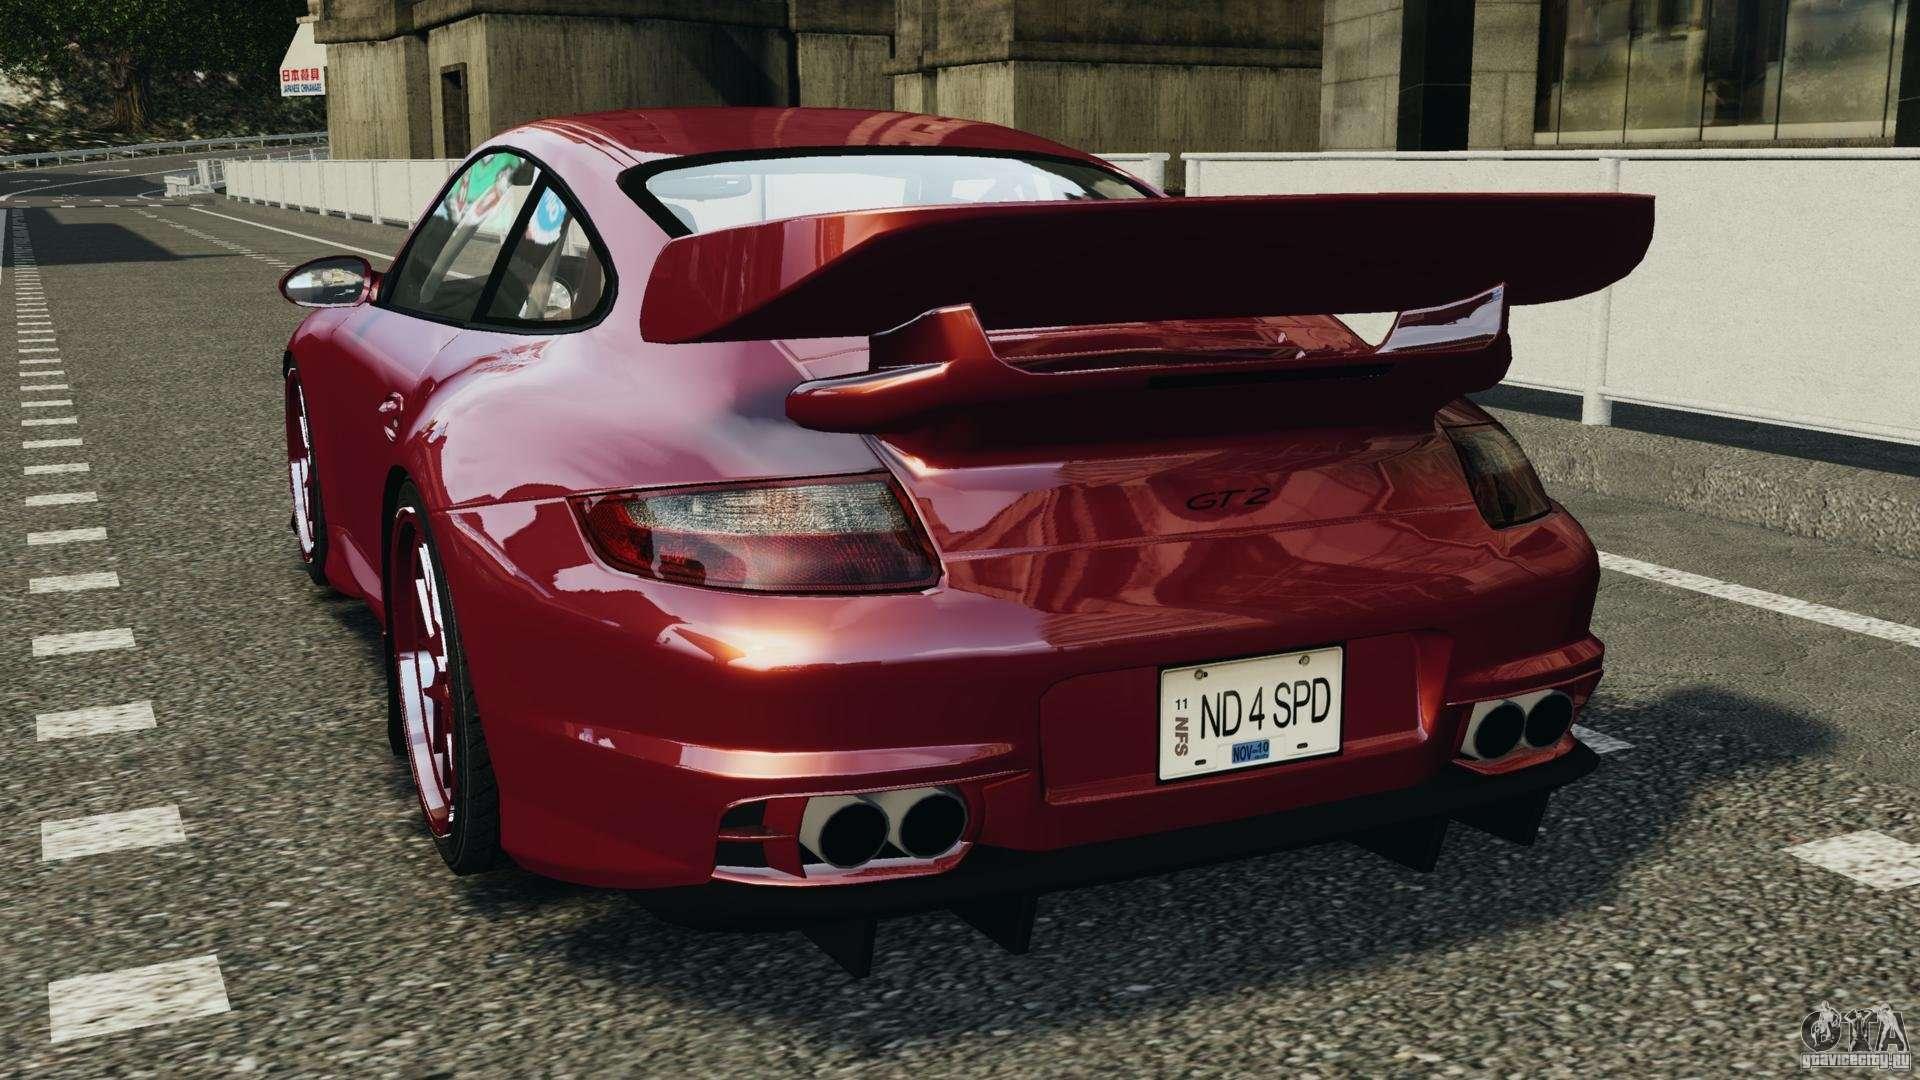 28487-1356693755-GTAIV2012-12-2814-42-41-55 Stunning Porsche 911 Gt2 Body Kit Cars Trend